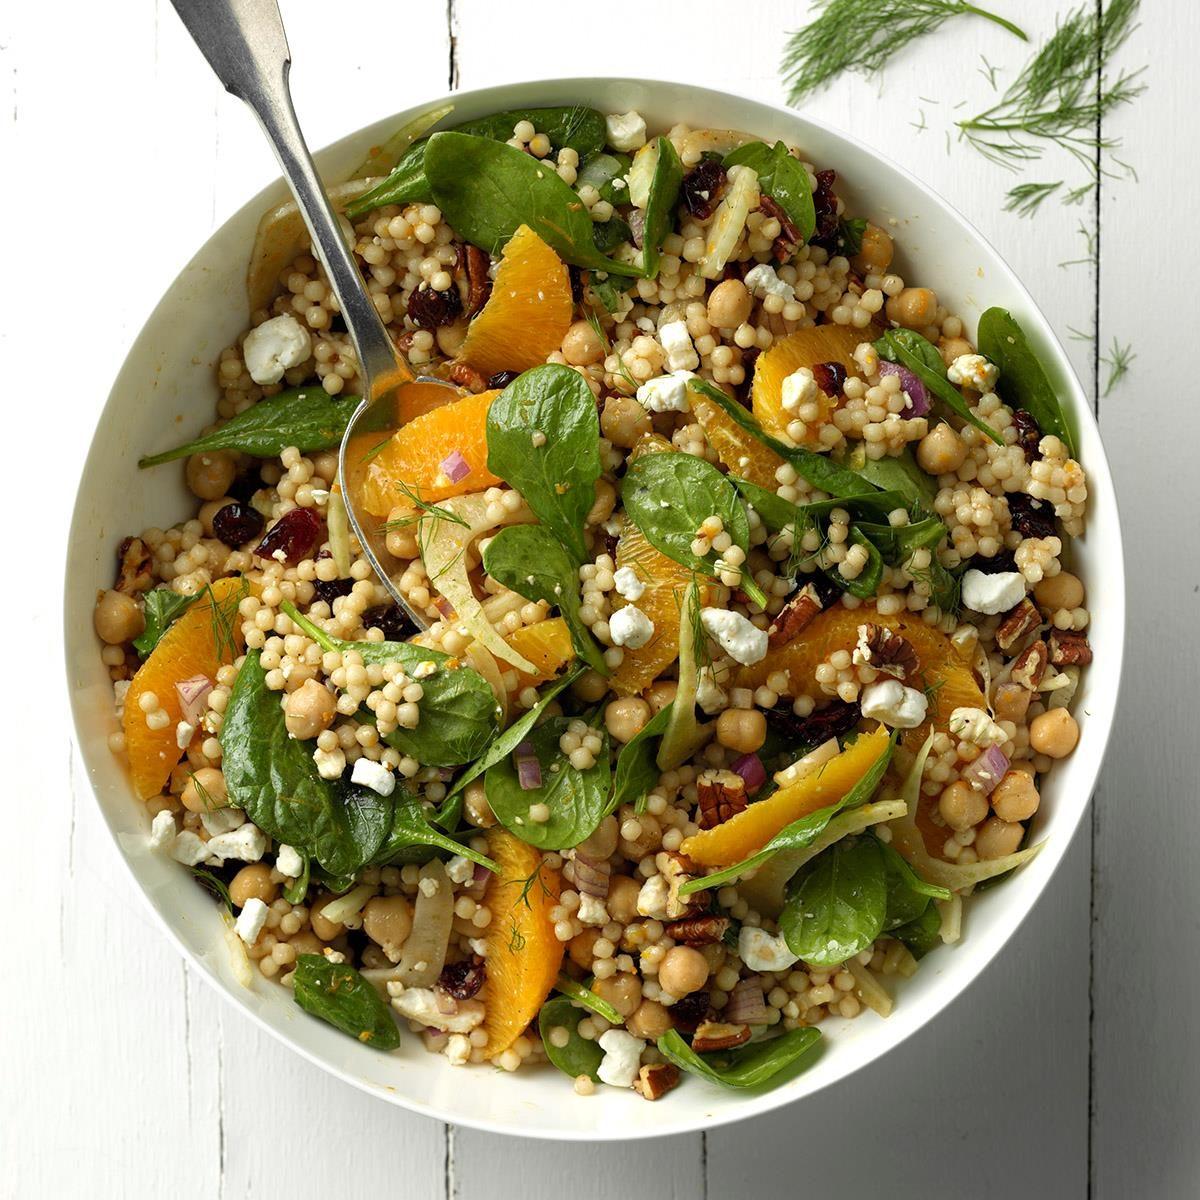 New York: Cran-Orange Couscous Salad